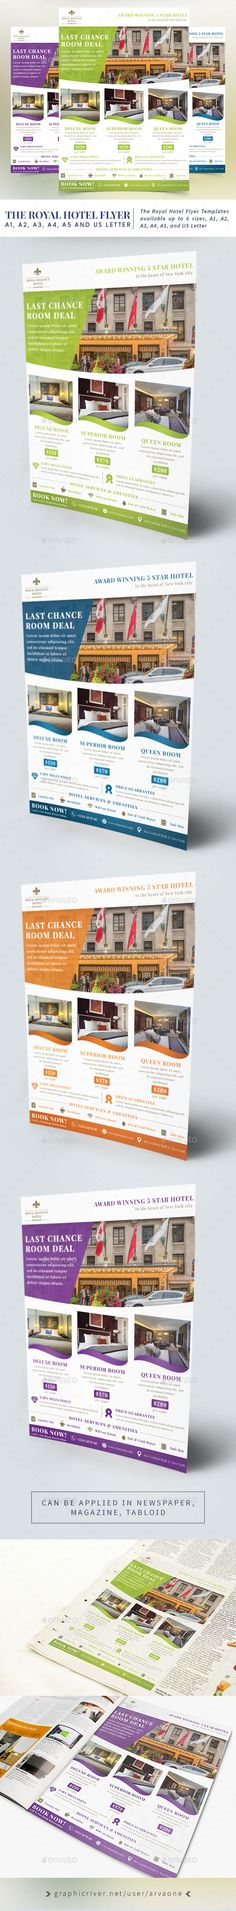 Endurance Church Marketing Flyer Template Bundle Marketing - promotional flyer template